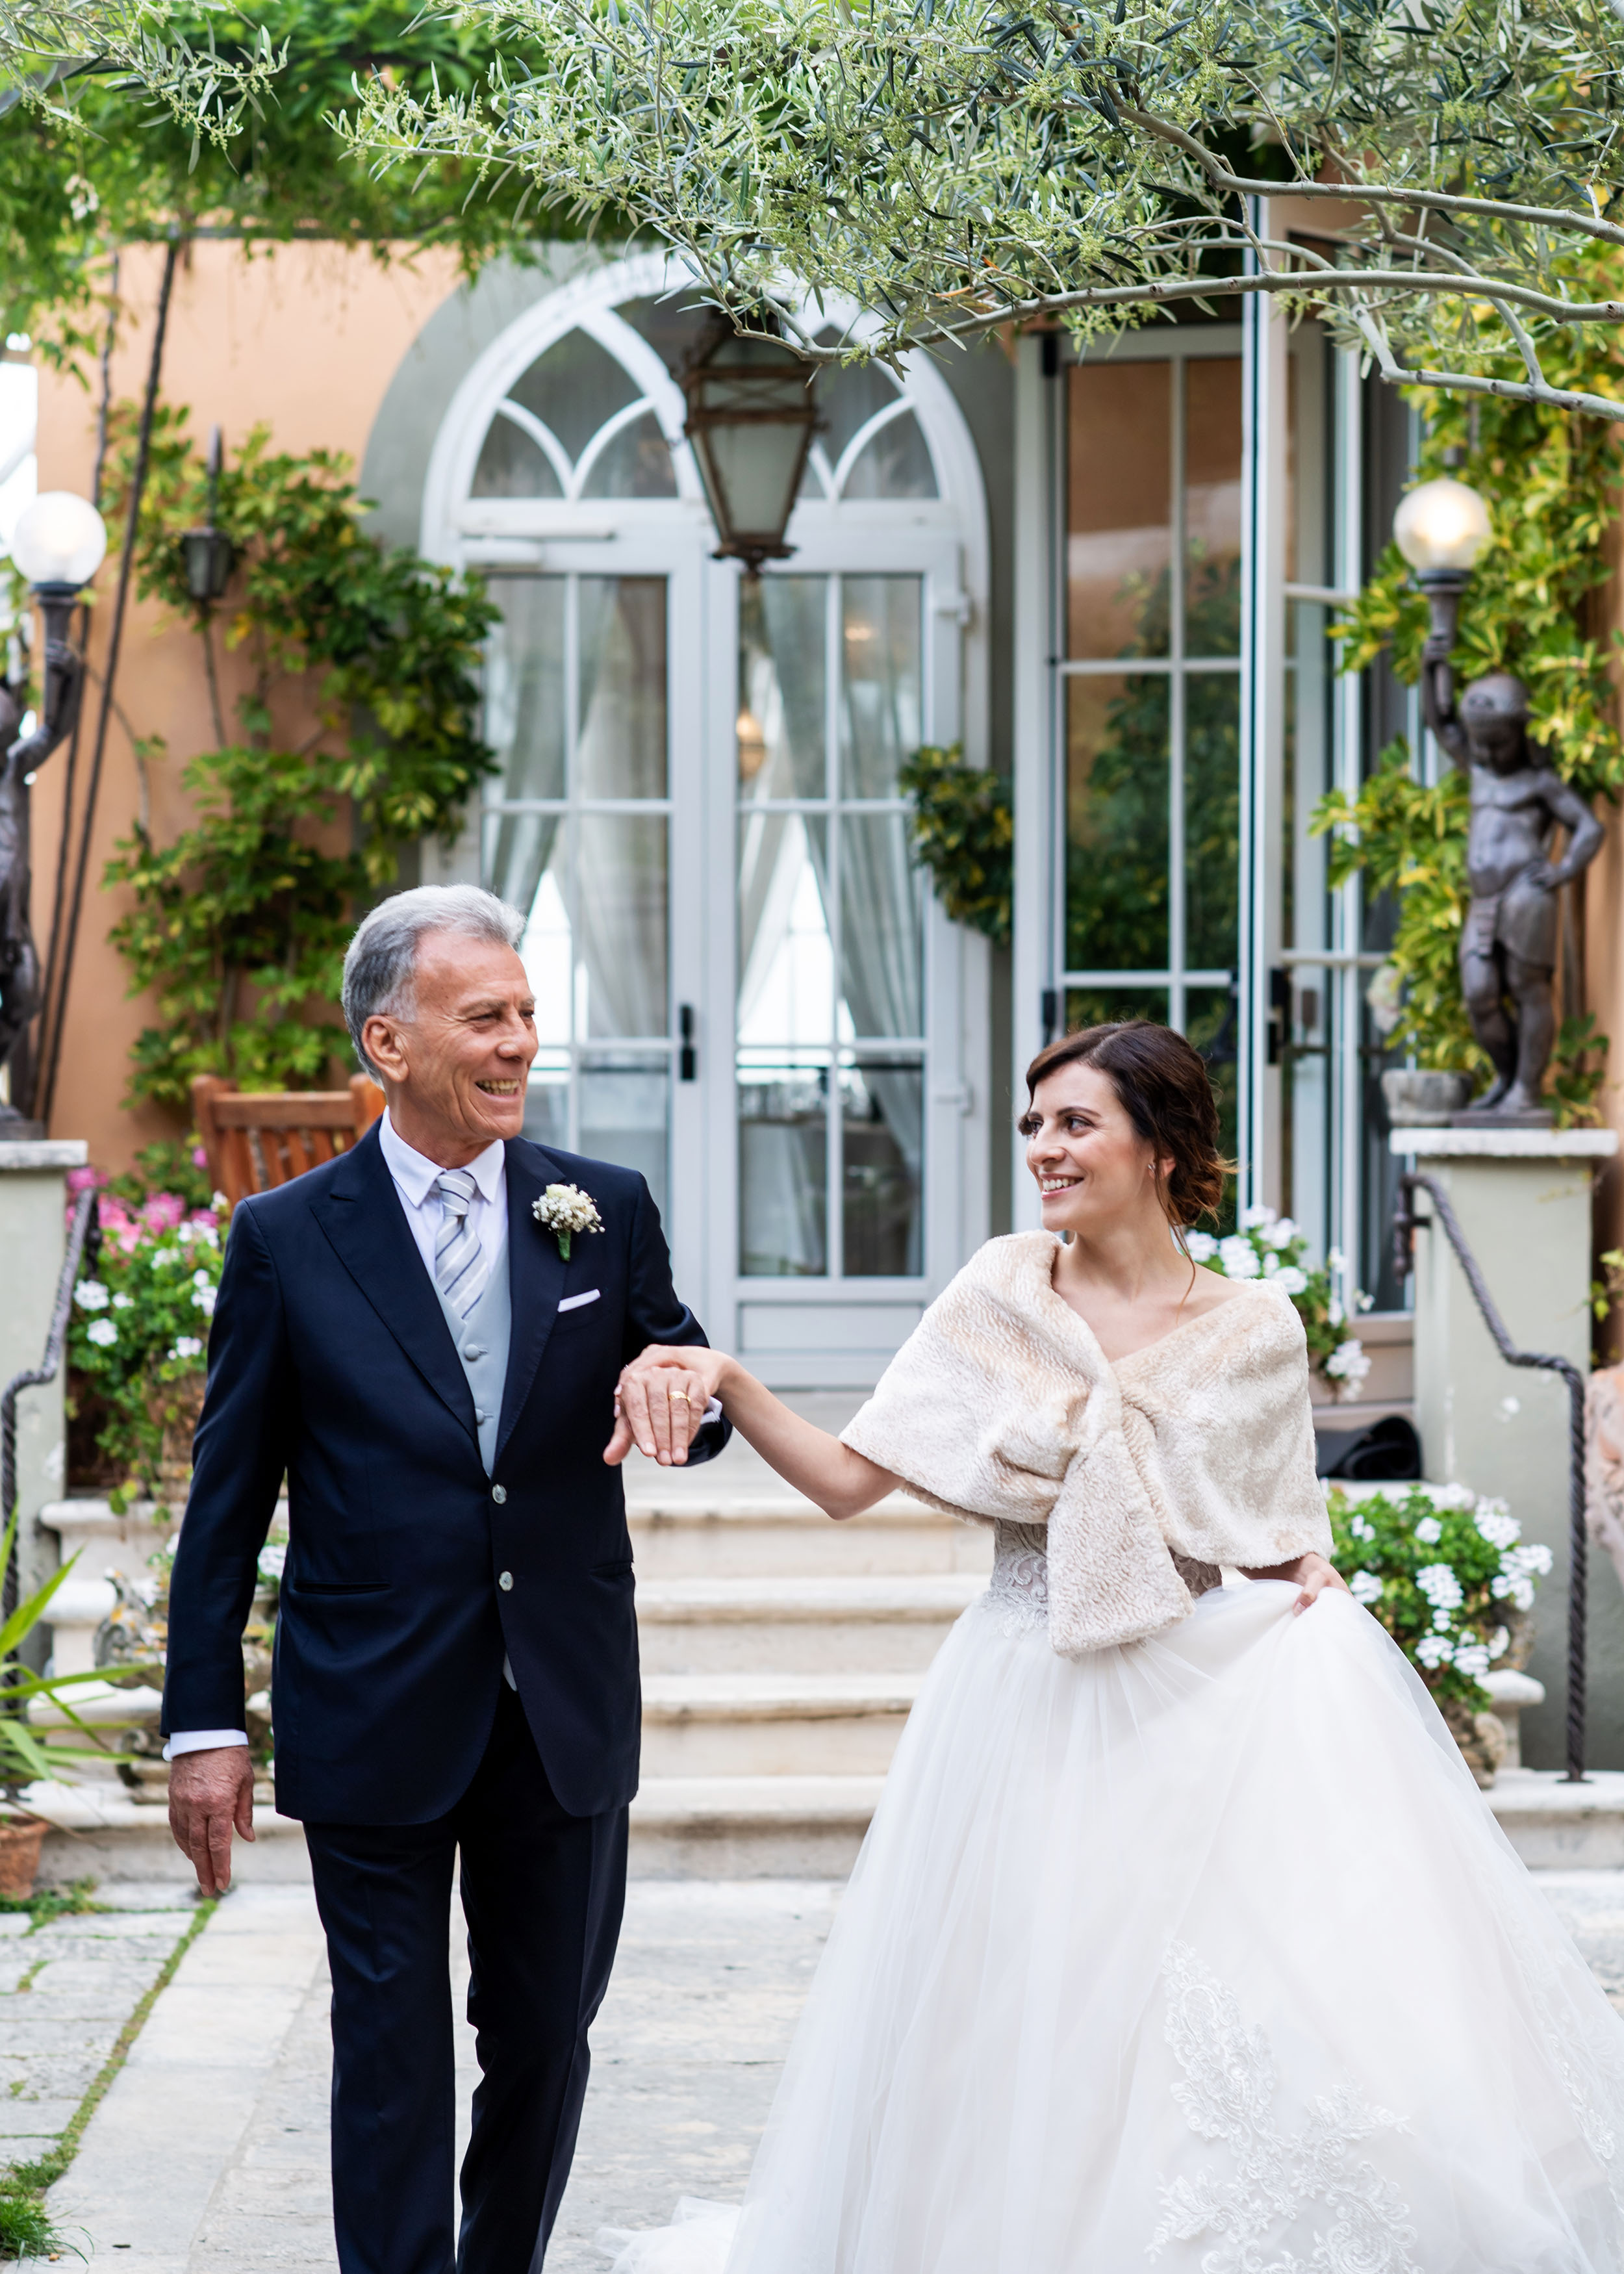 https://www.weddingamalfi.com/wp-content/uploads/Katia-Jorge-18-maggio-2019-20.jpg